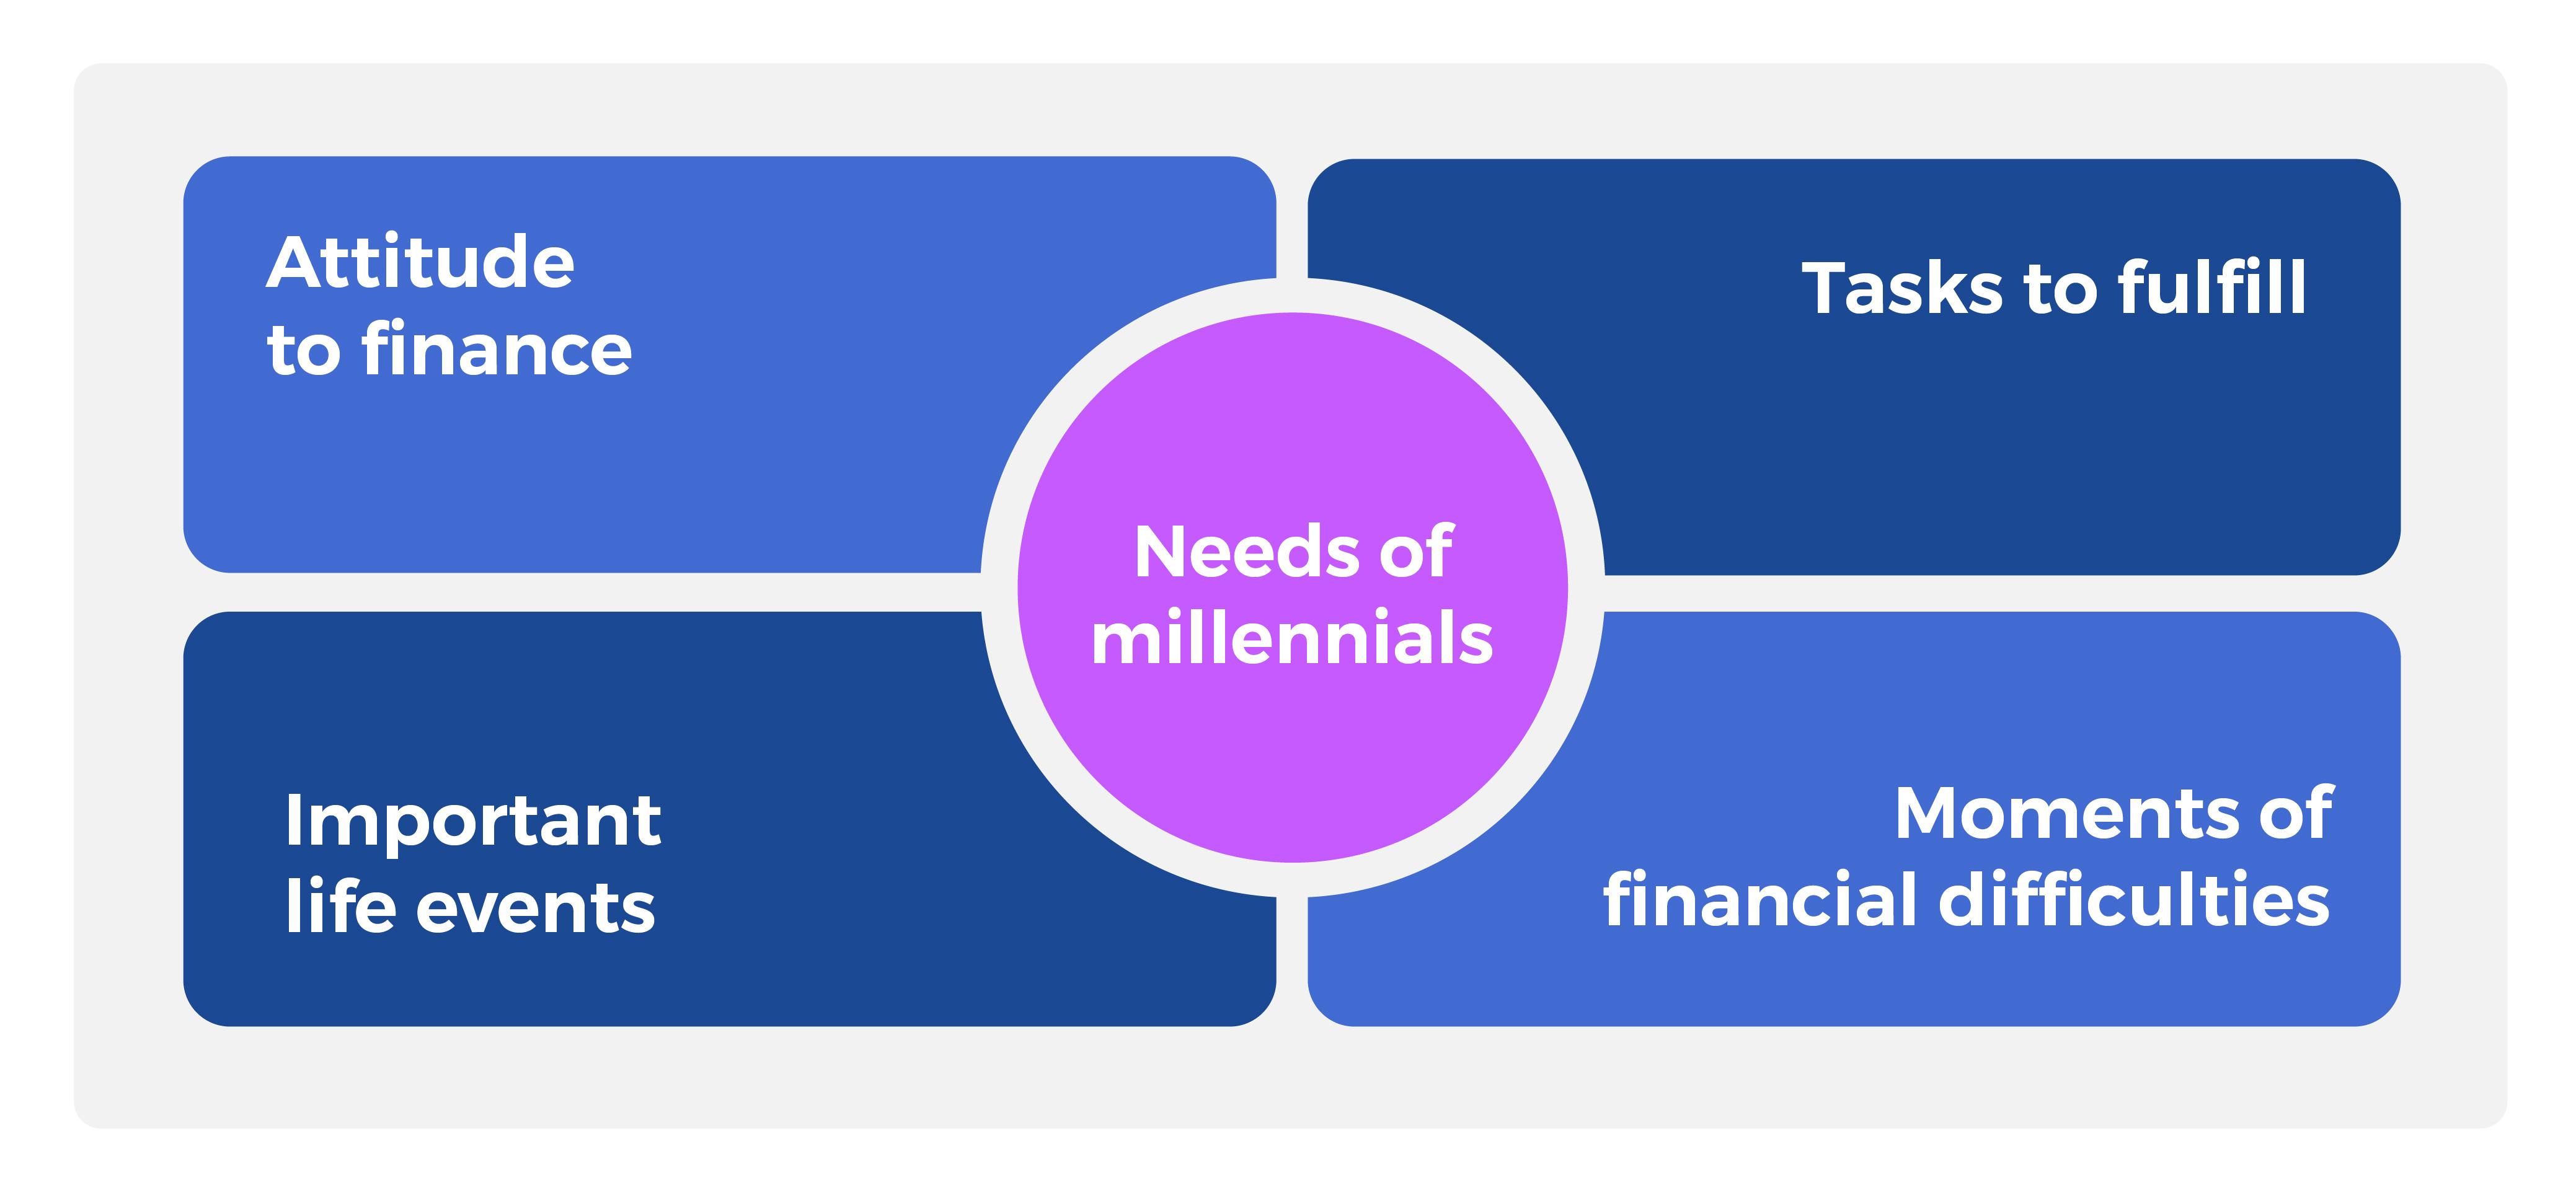 needs of millennials in digital banking